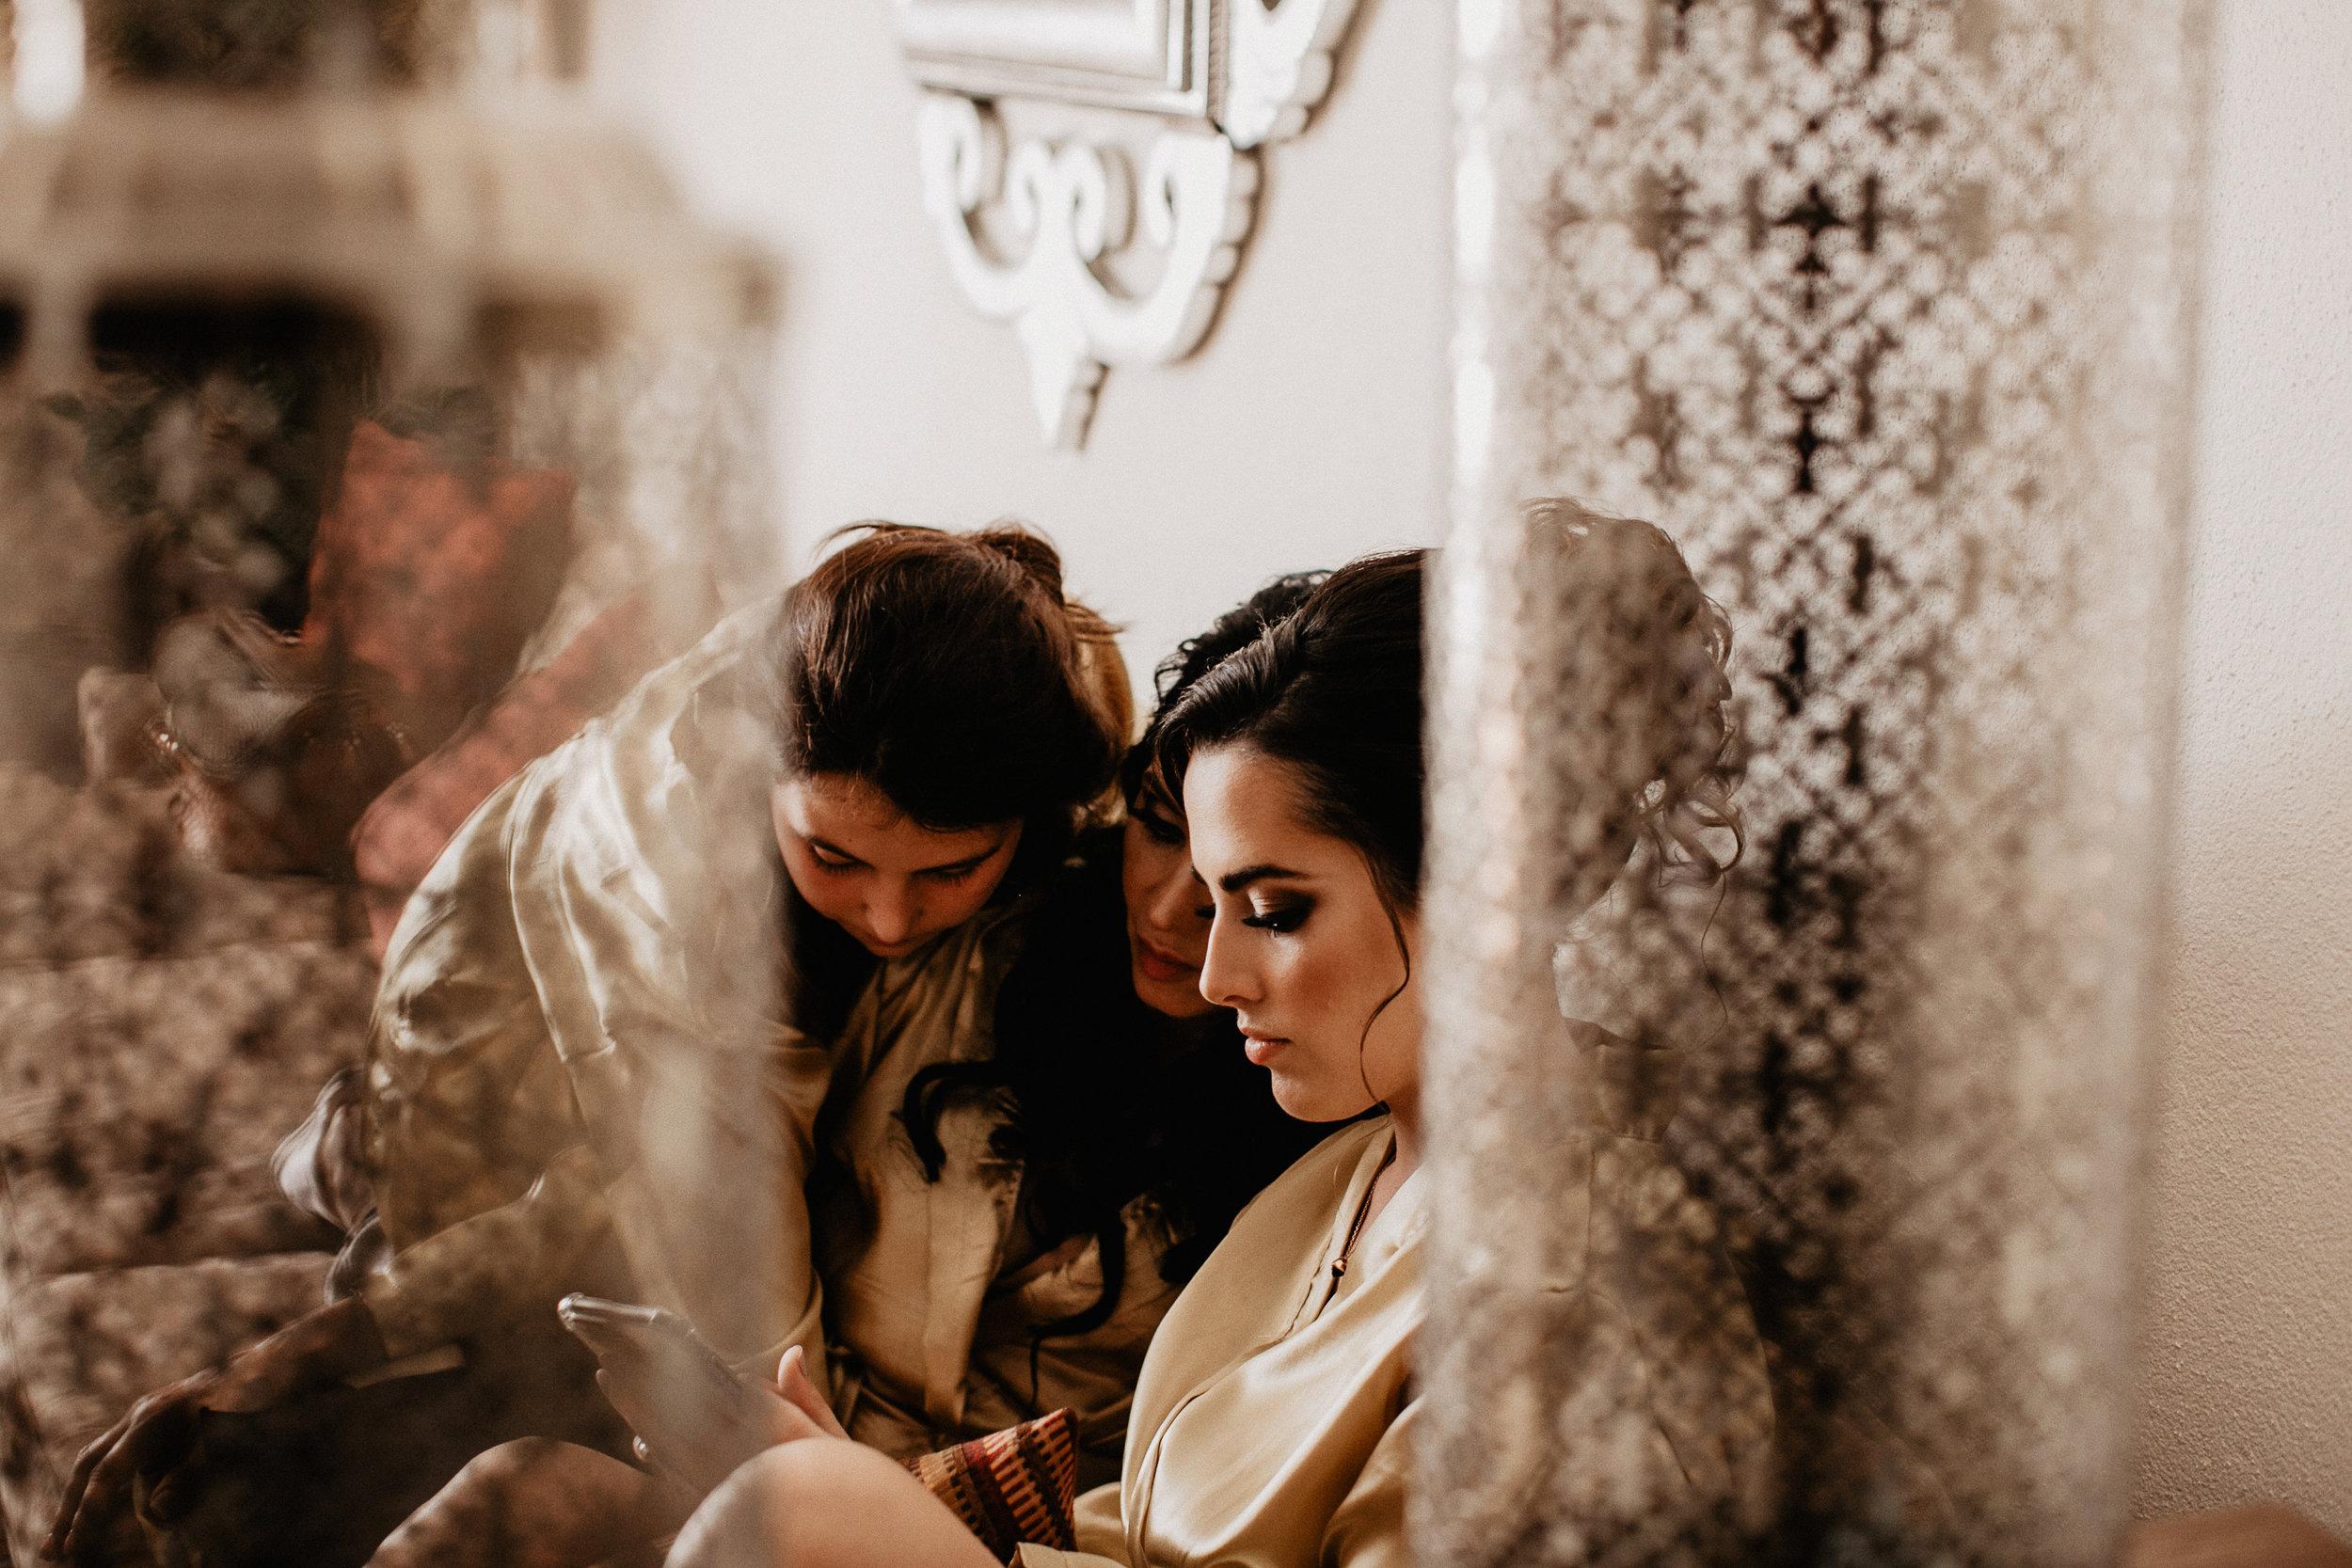 Alfonso_flores_destination_wedding_photography_vanesa_carlos-7.JPG